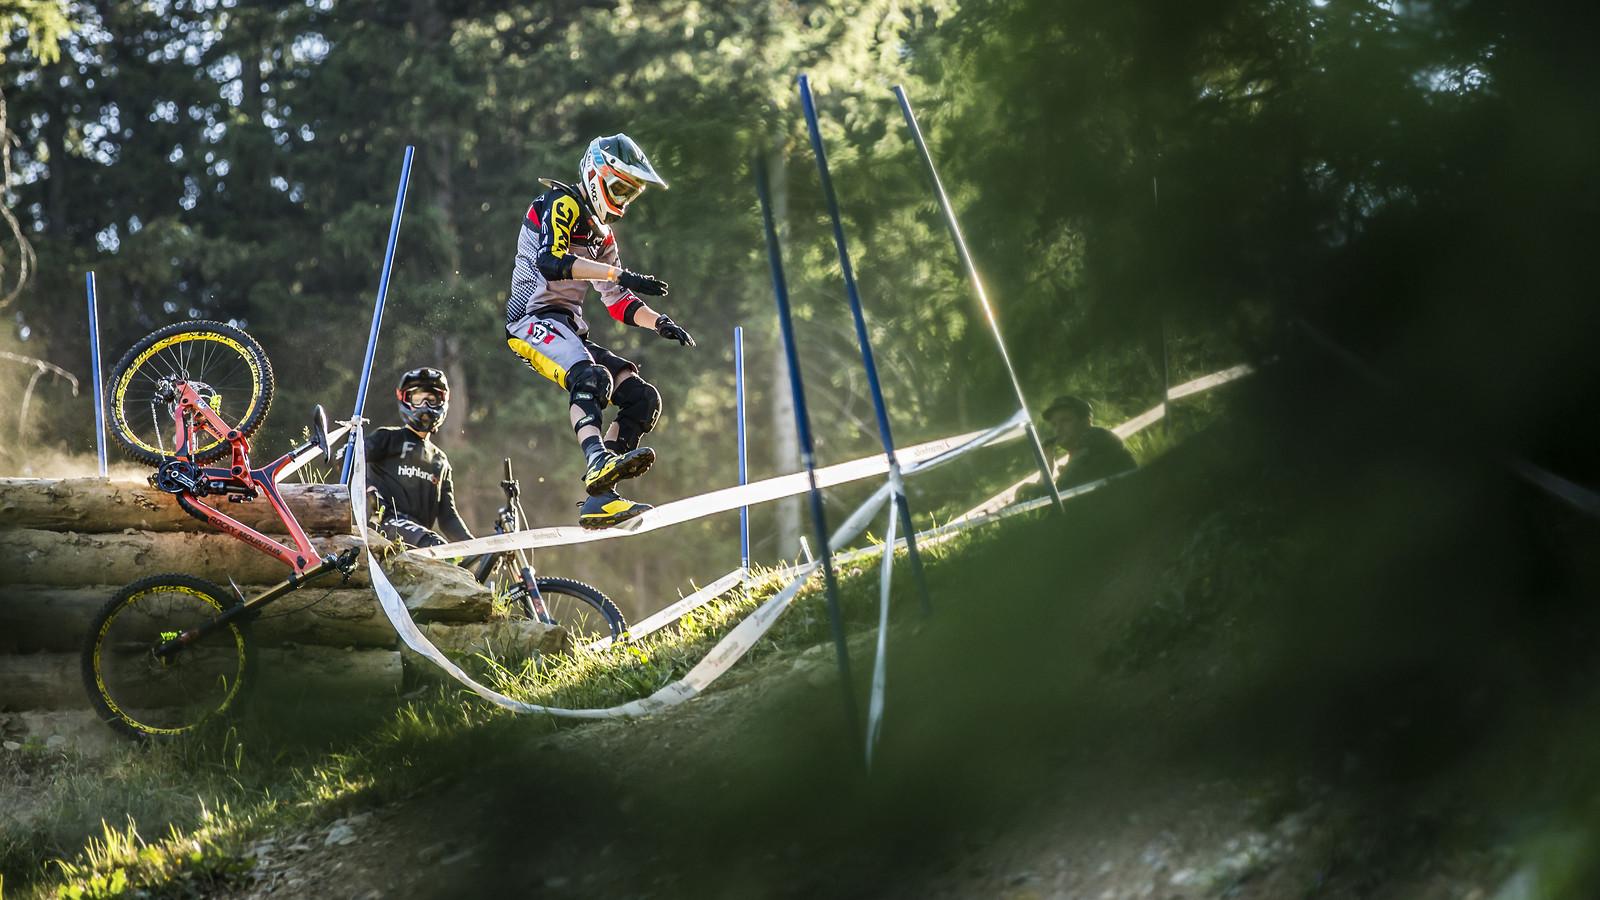 HUN8178 - phunkt.com - Mountain Biking Pictures - Vital MTB